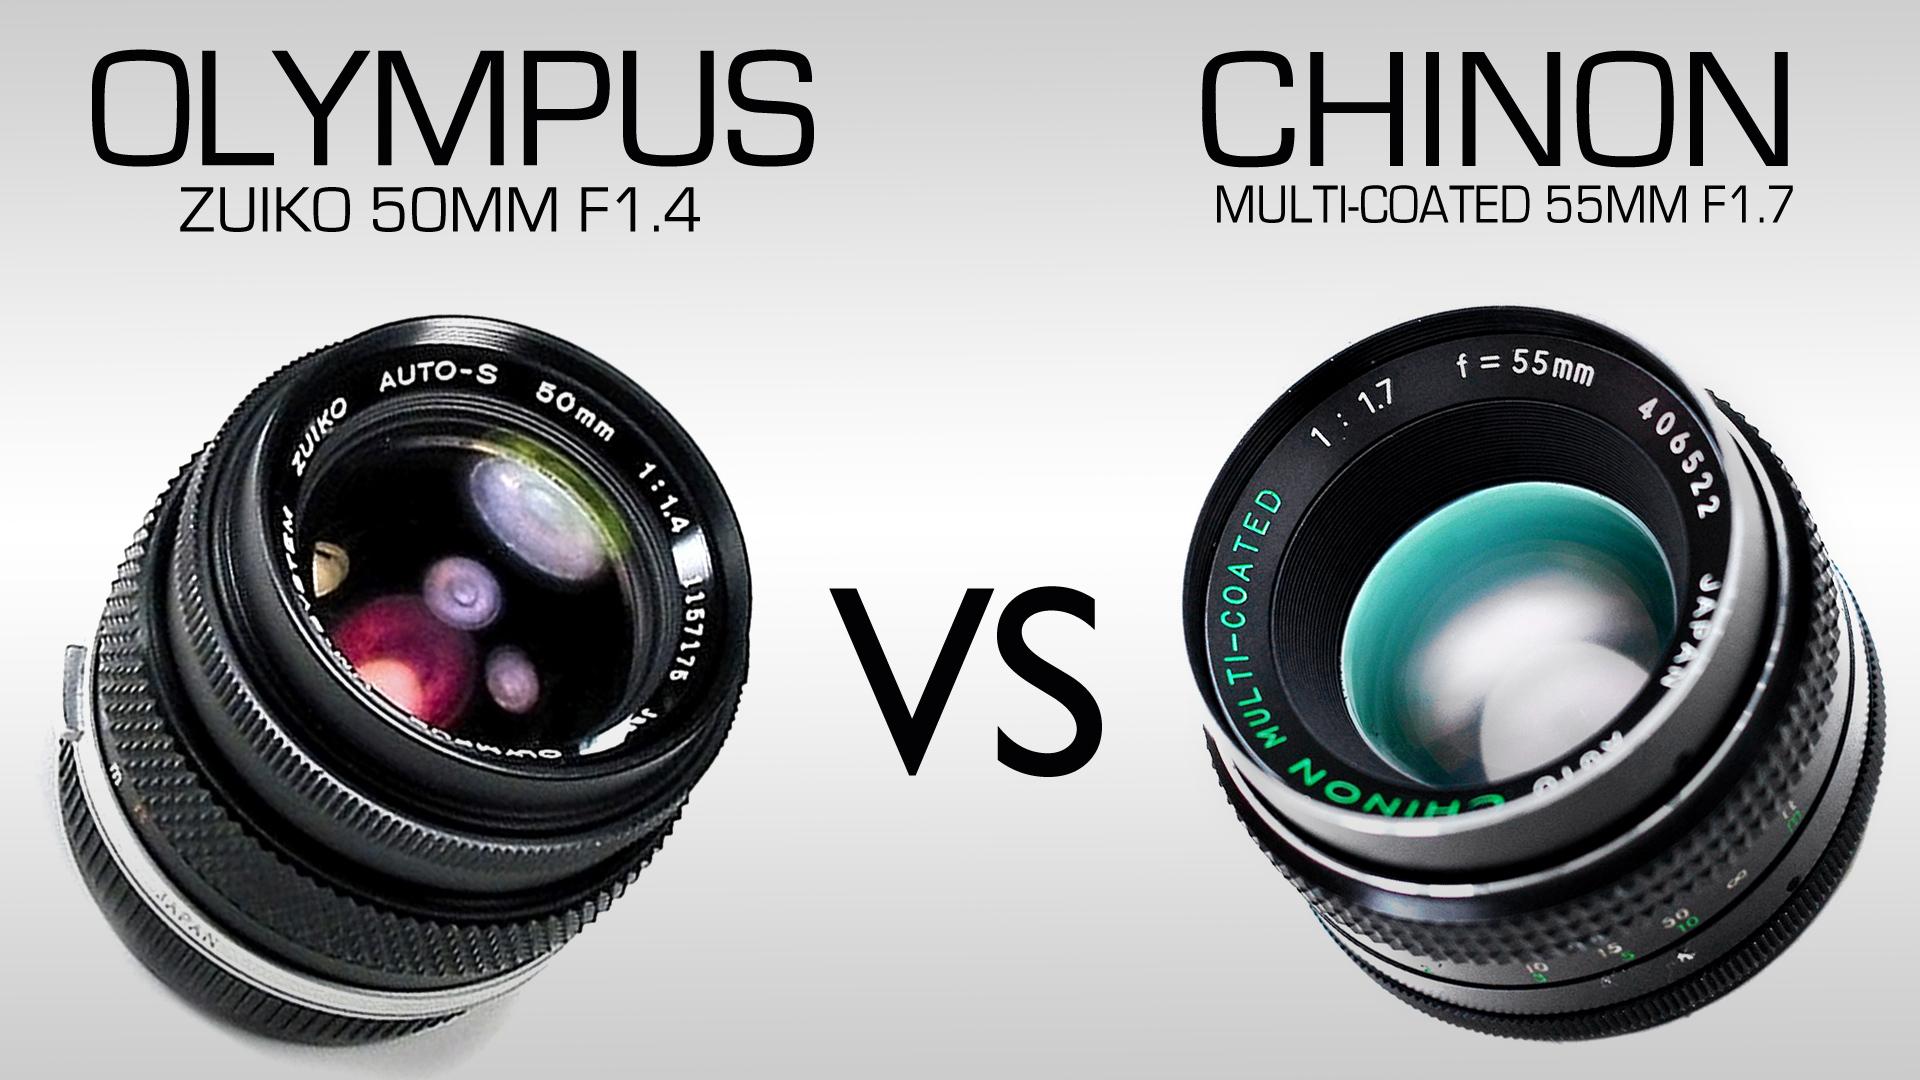 Olympus Zuiko 50mm F1.4 VS Chinon Multi-Coated 55mm F1.7